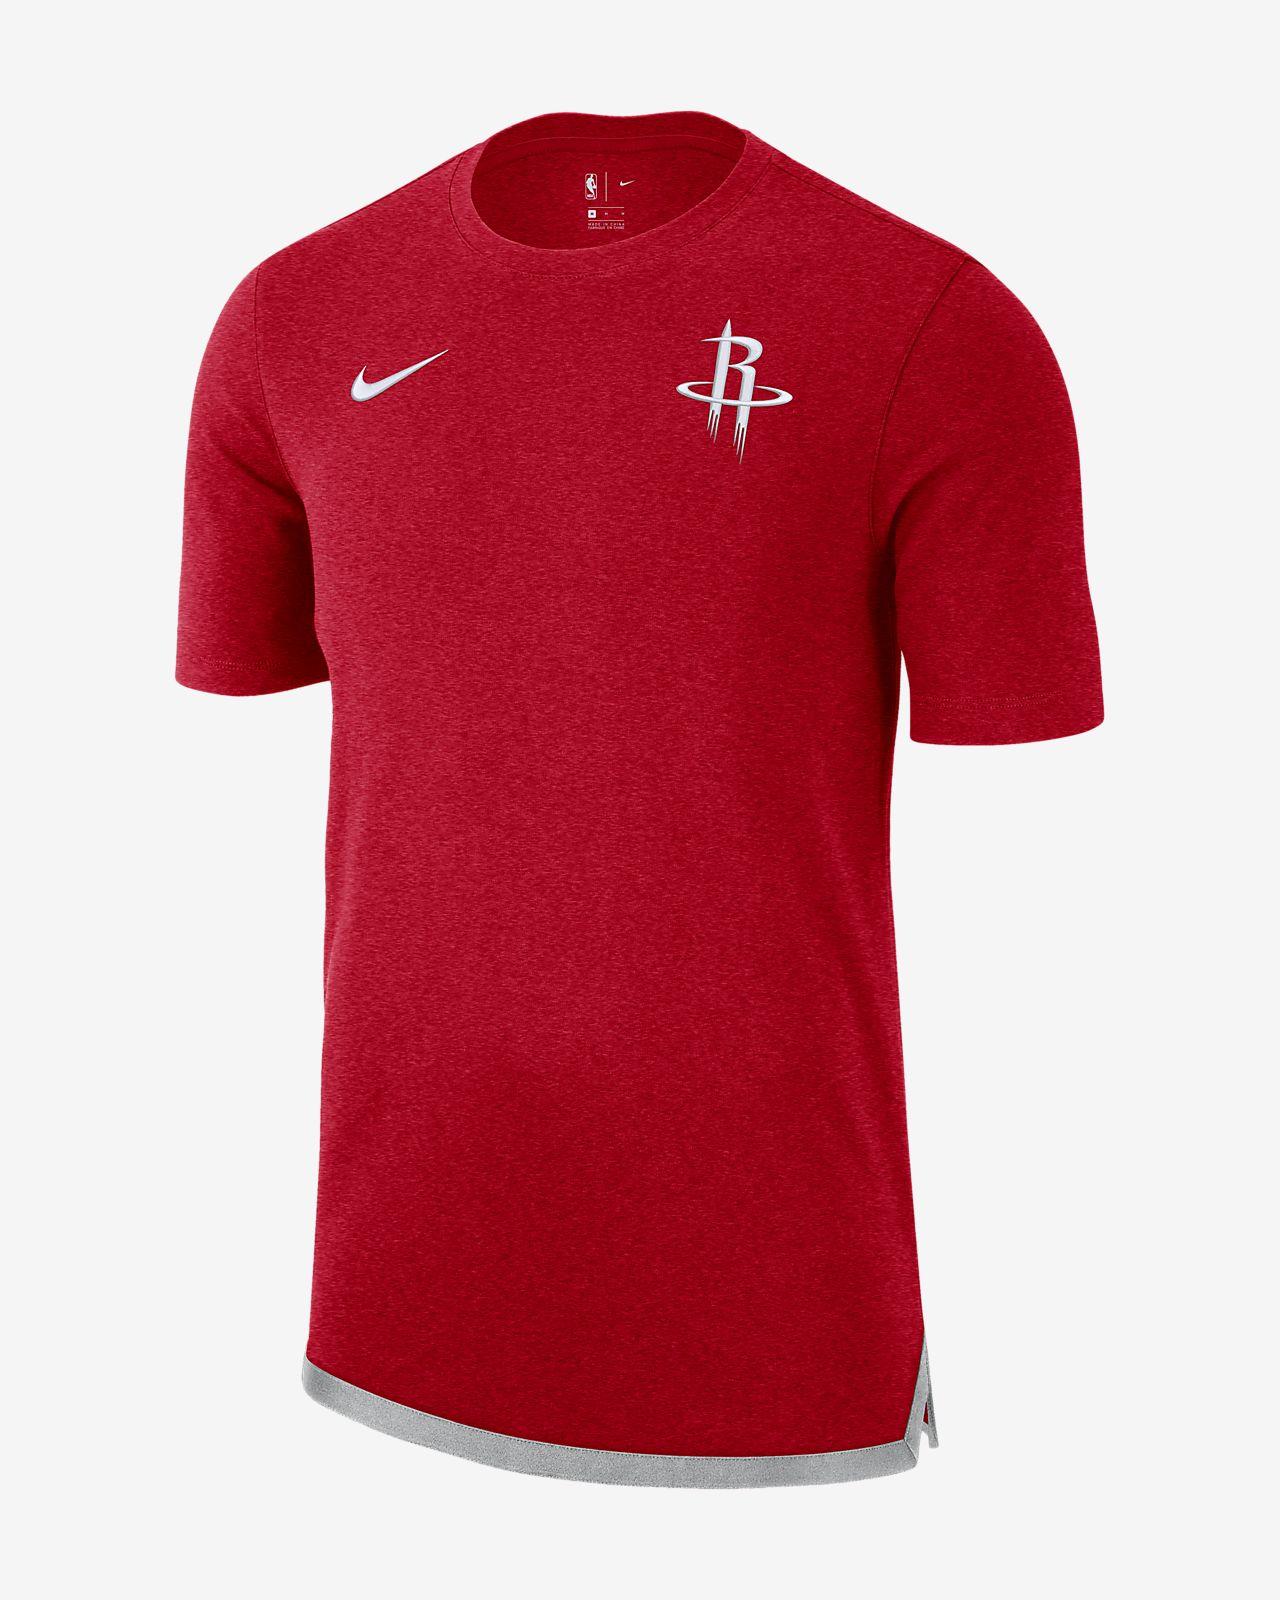 2c87d85c44fe Houston Rockets Nike Men s NBA Top. Nike.com